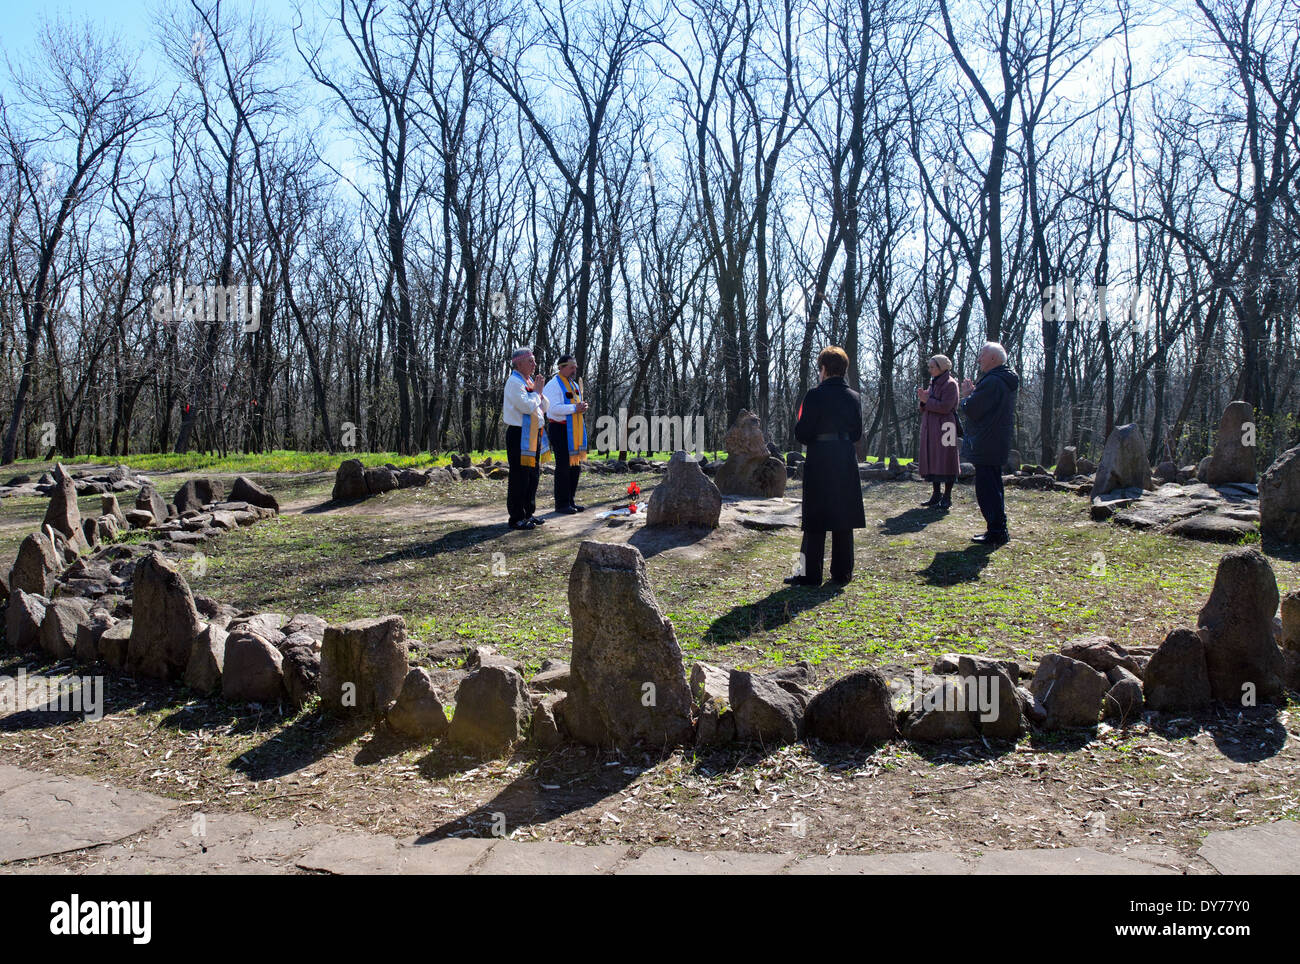 Proto-Slavic pagan rituals in Ukraine  Beginning of the Slavic pagan